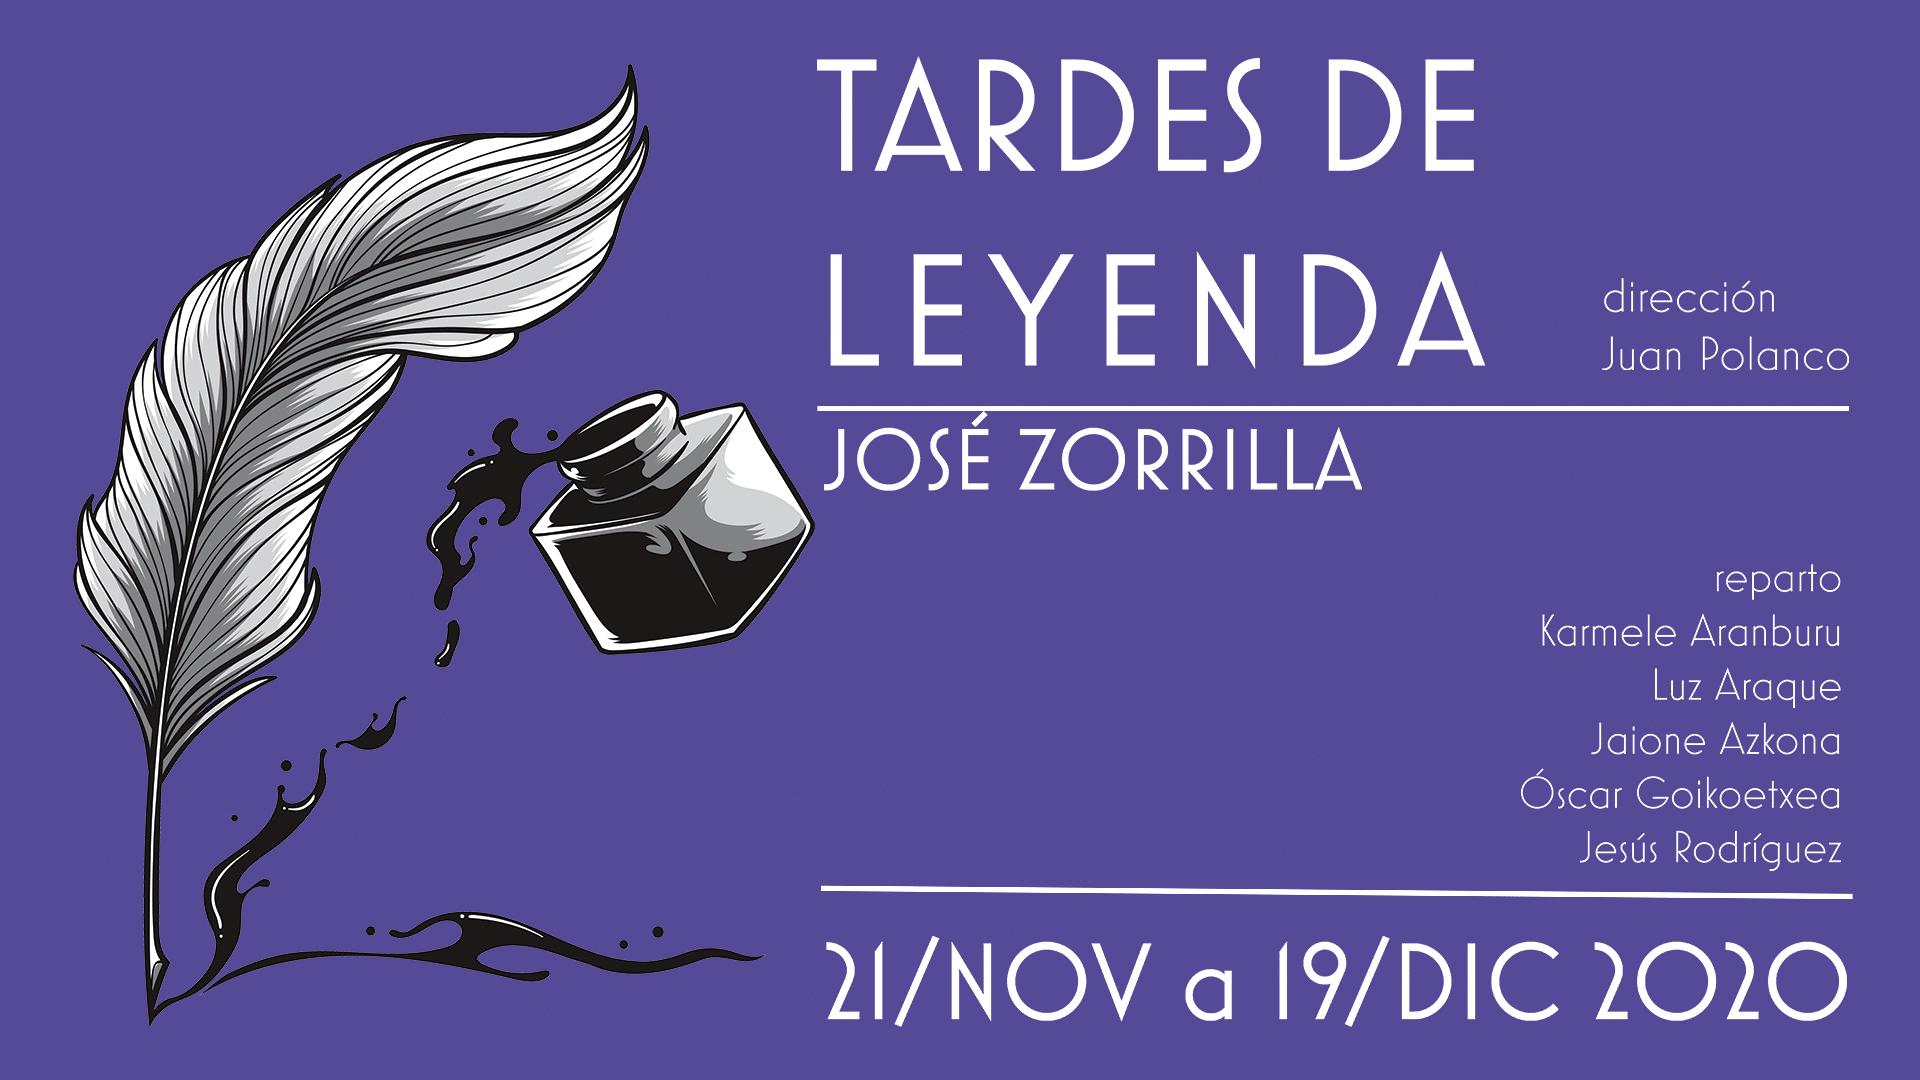 Tardes de Leyenda